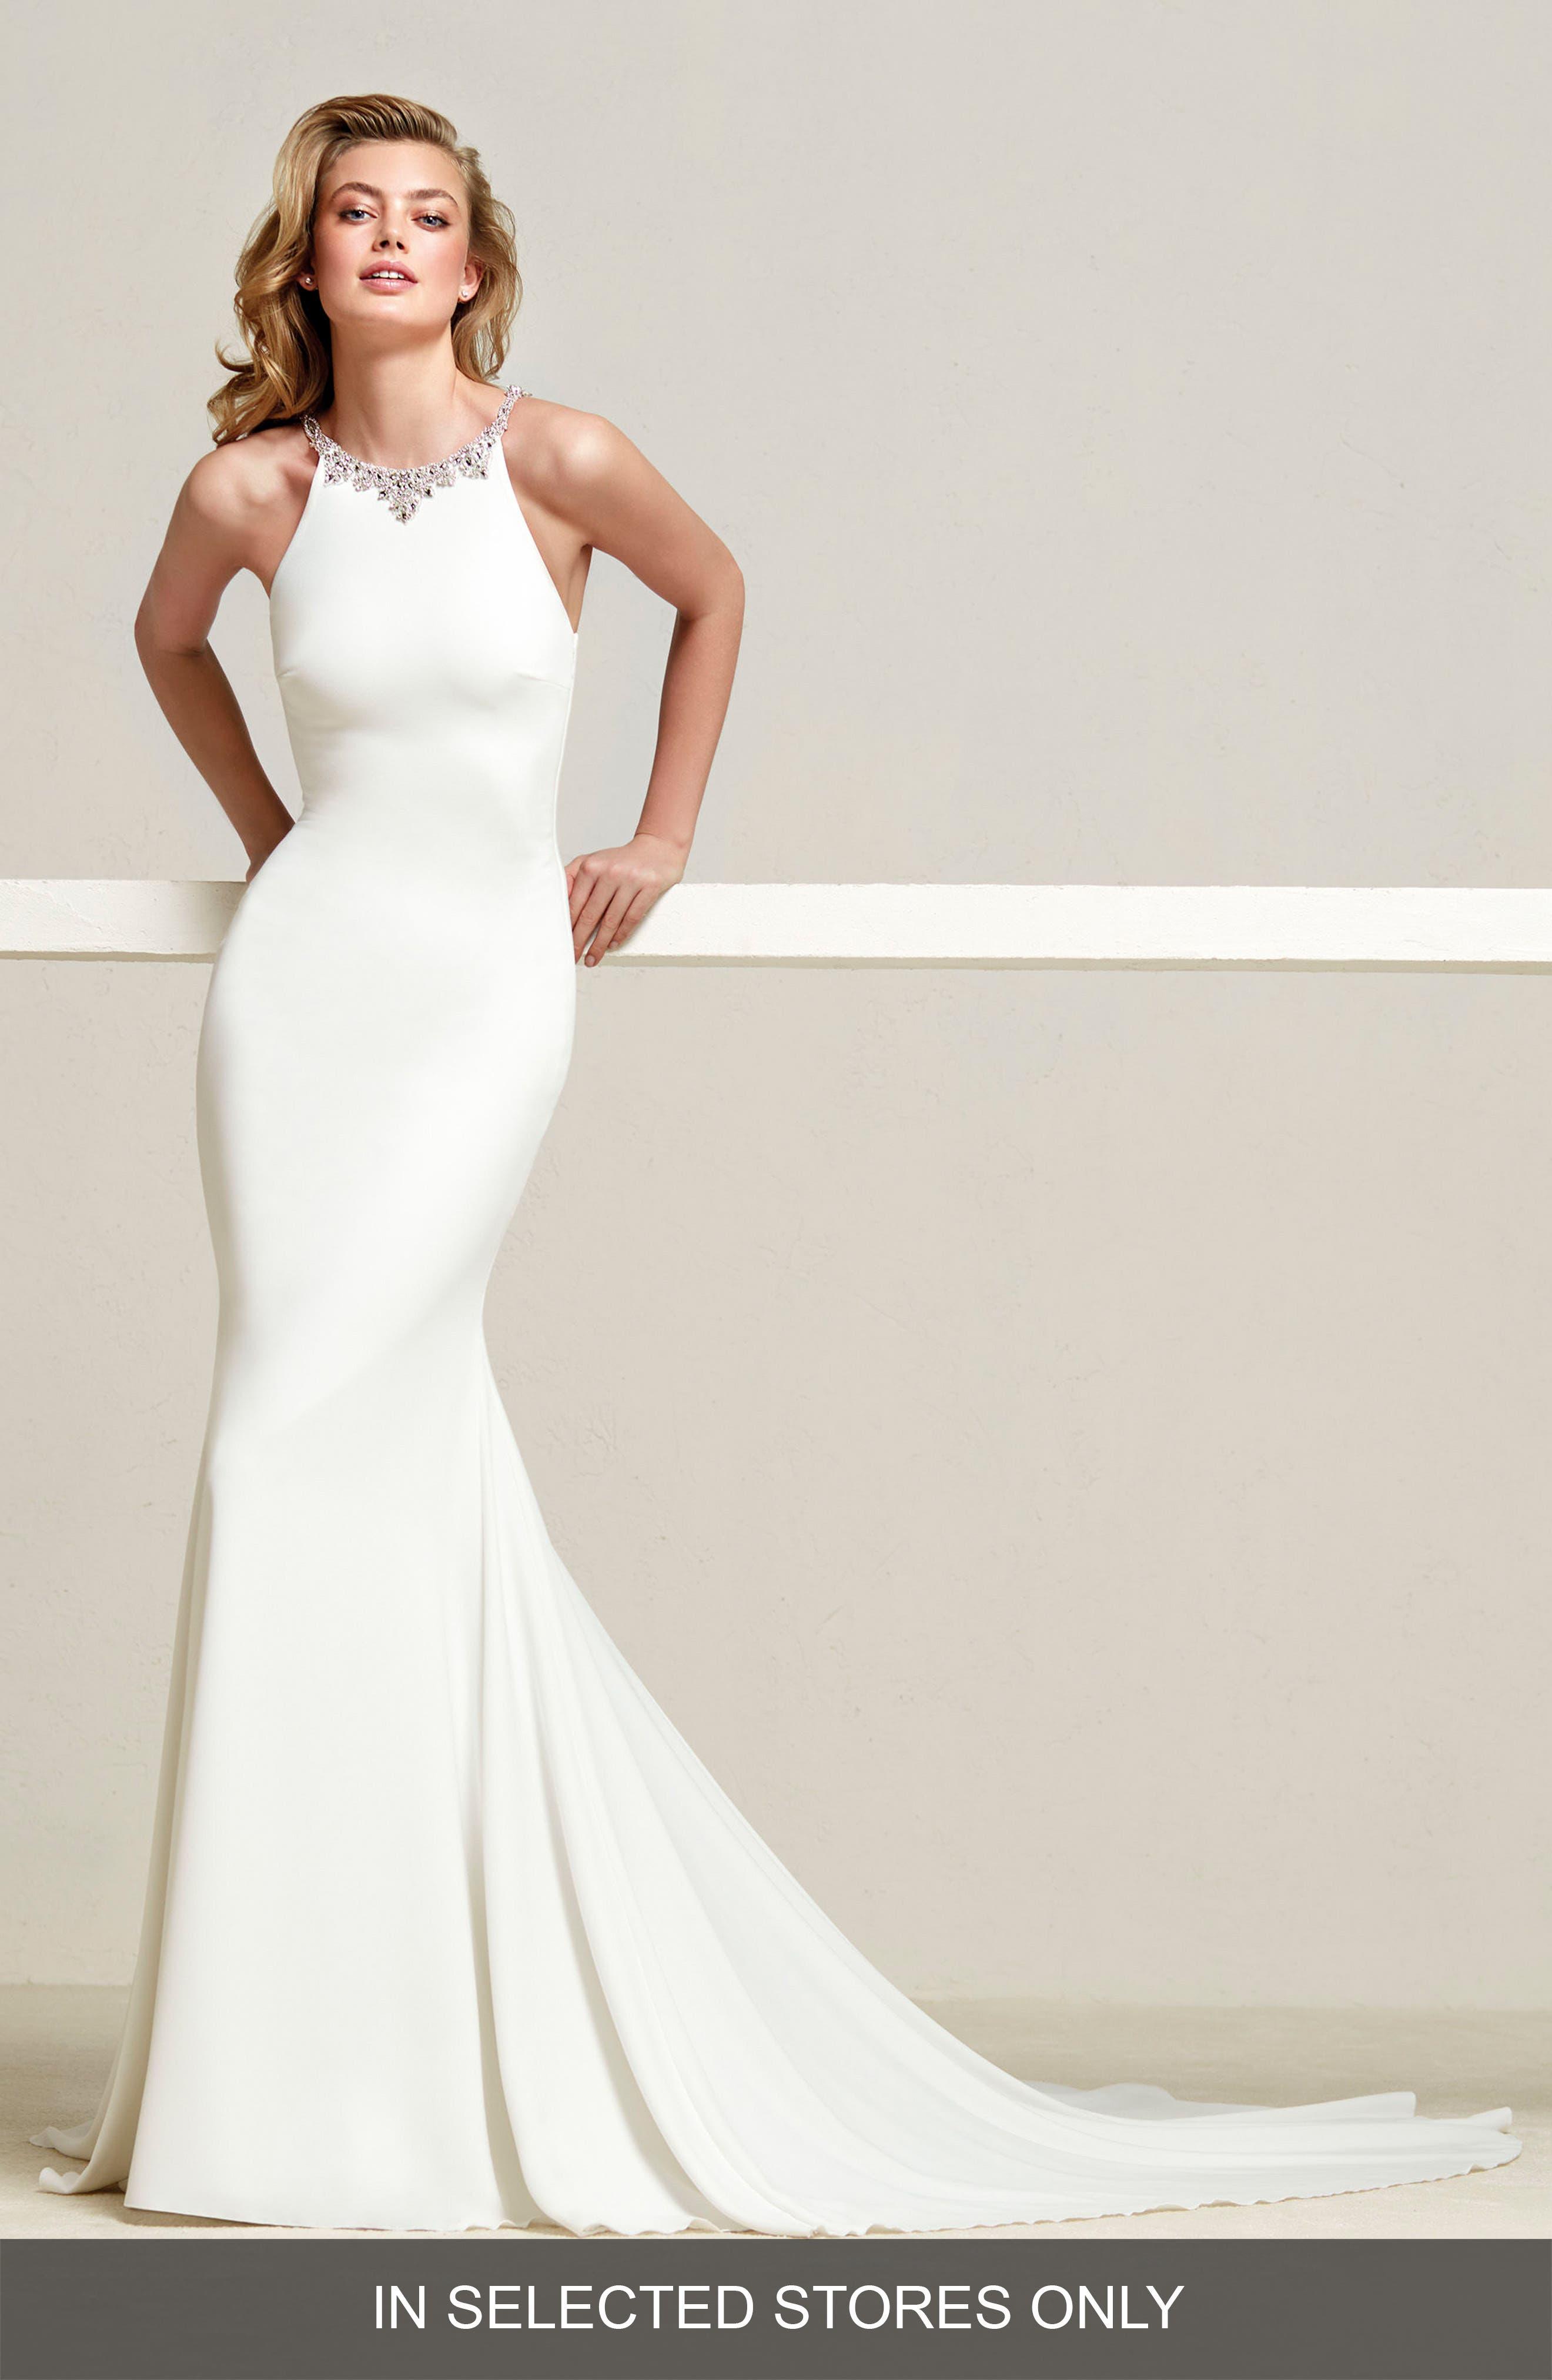 Dreba Jeweled Back Crepe Mermaid Gown,                             Main thumbnail 1, color,                             OFF WHITE/CRYSTAL